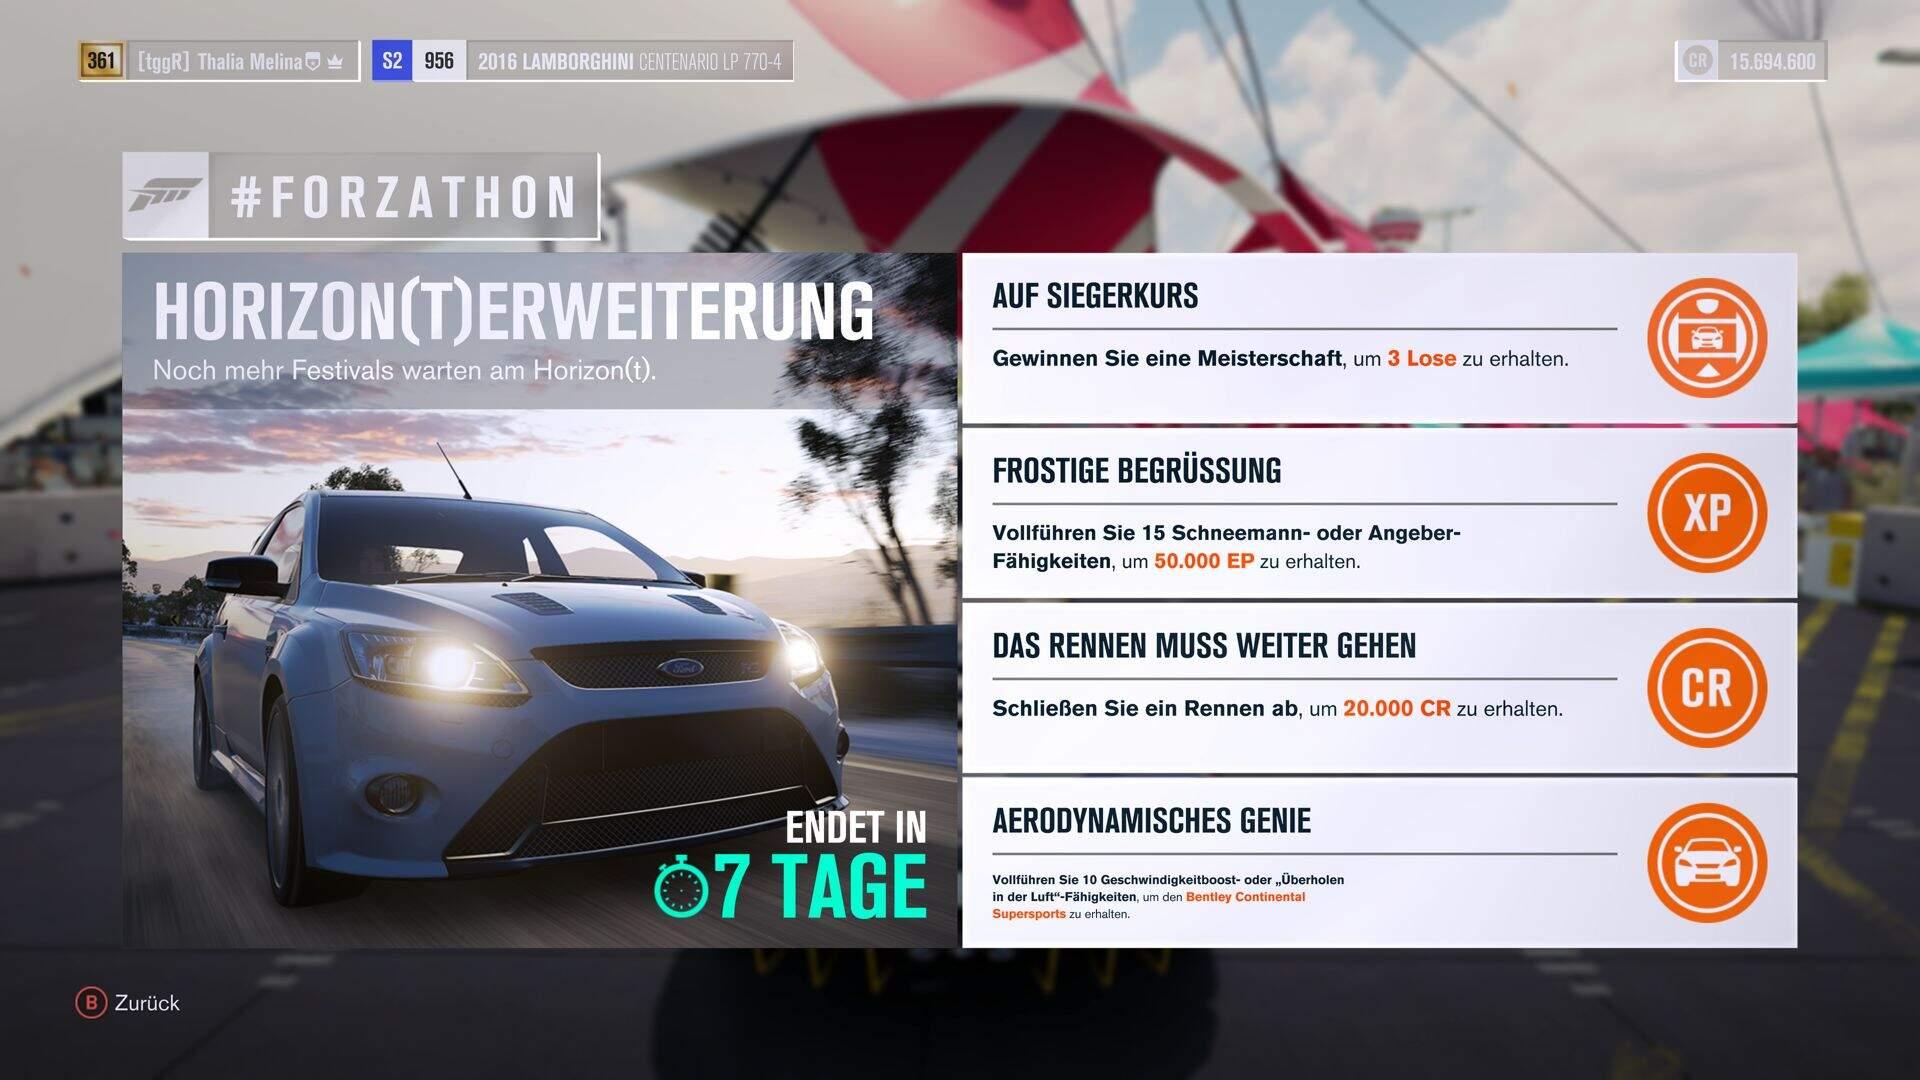 Forza Horizon 3 #Forzathon Guide KW 40 – Hoirzon(t)erweiterung